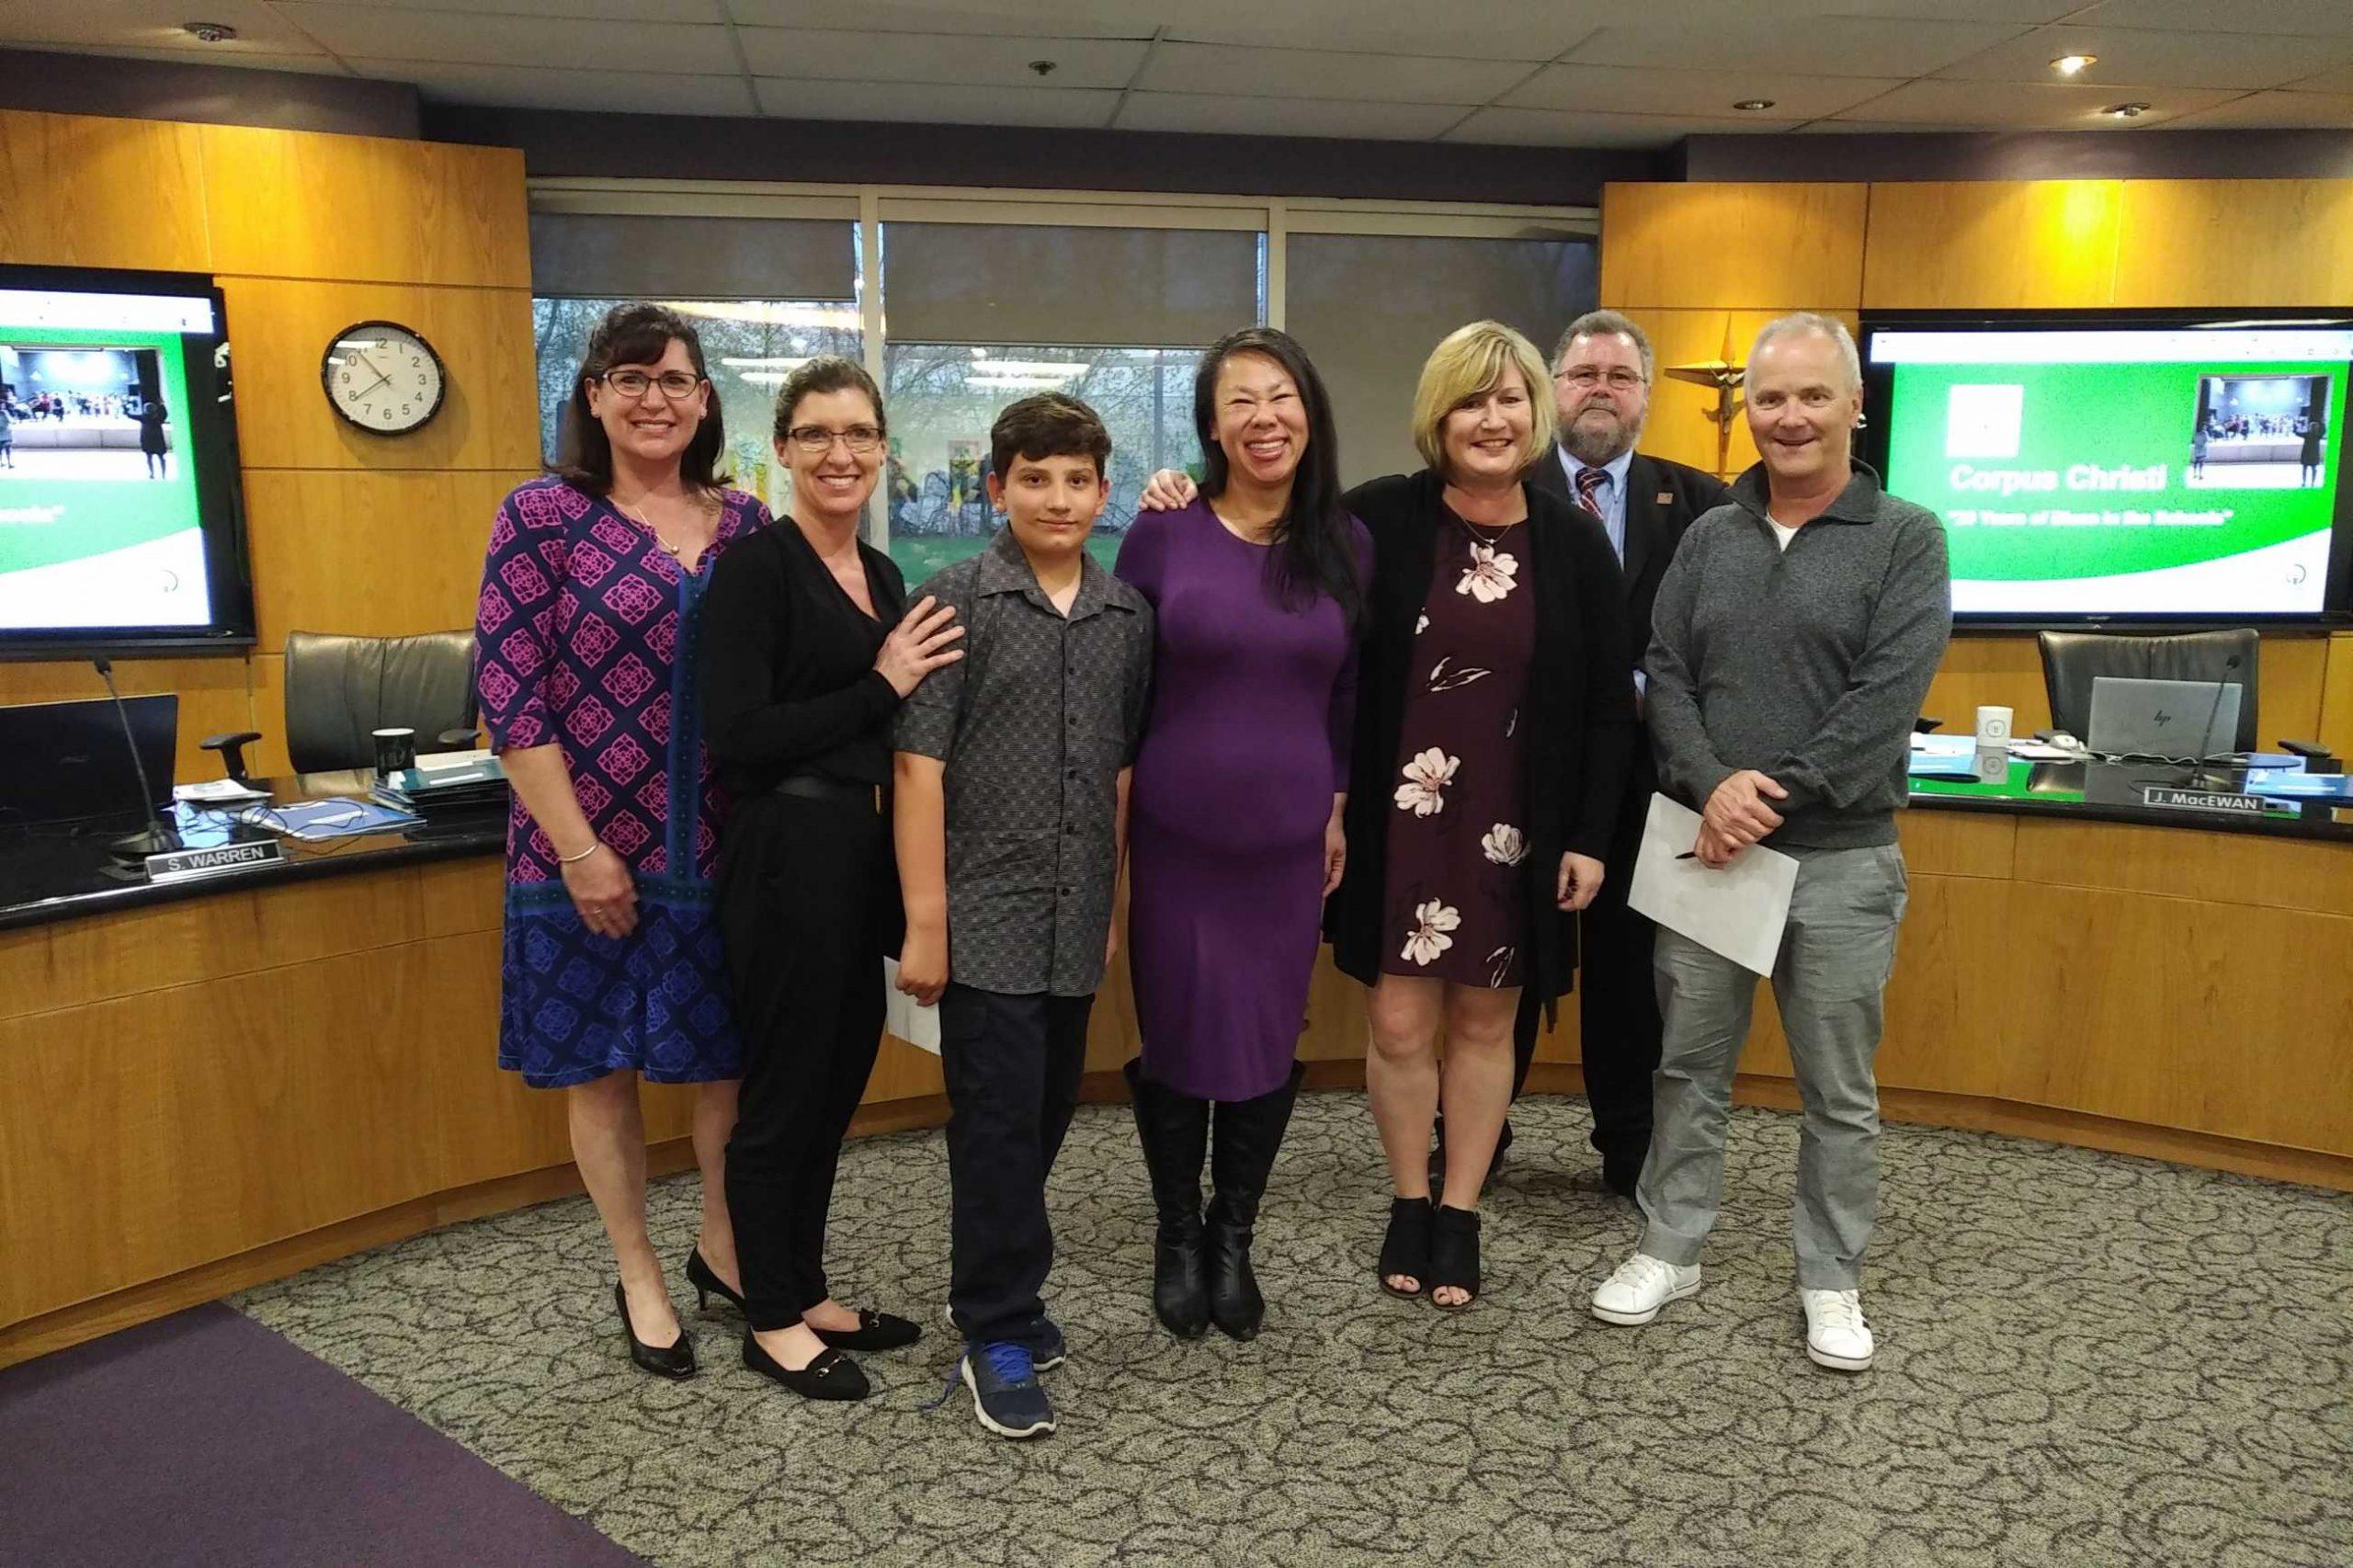 Left to right: Colleen Loubser, teacher; Renee Corrigan, teacher; Julian Fuenzalida, student; Jeannie Wong, teacher; Sheri Stashick, principal; Mark D. Mullan, Chairperson; and Mark Monahan, Executive Director-Bluesfest.